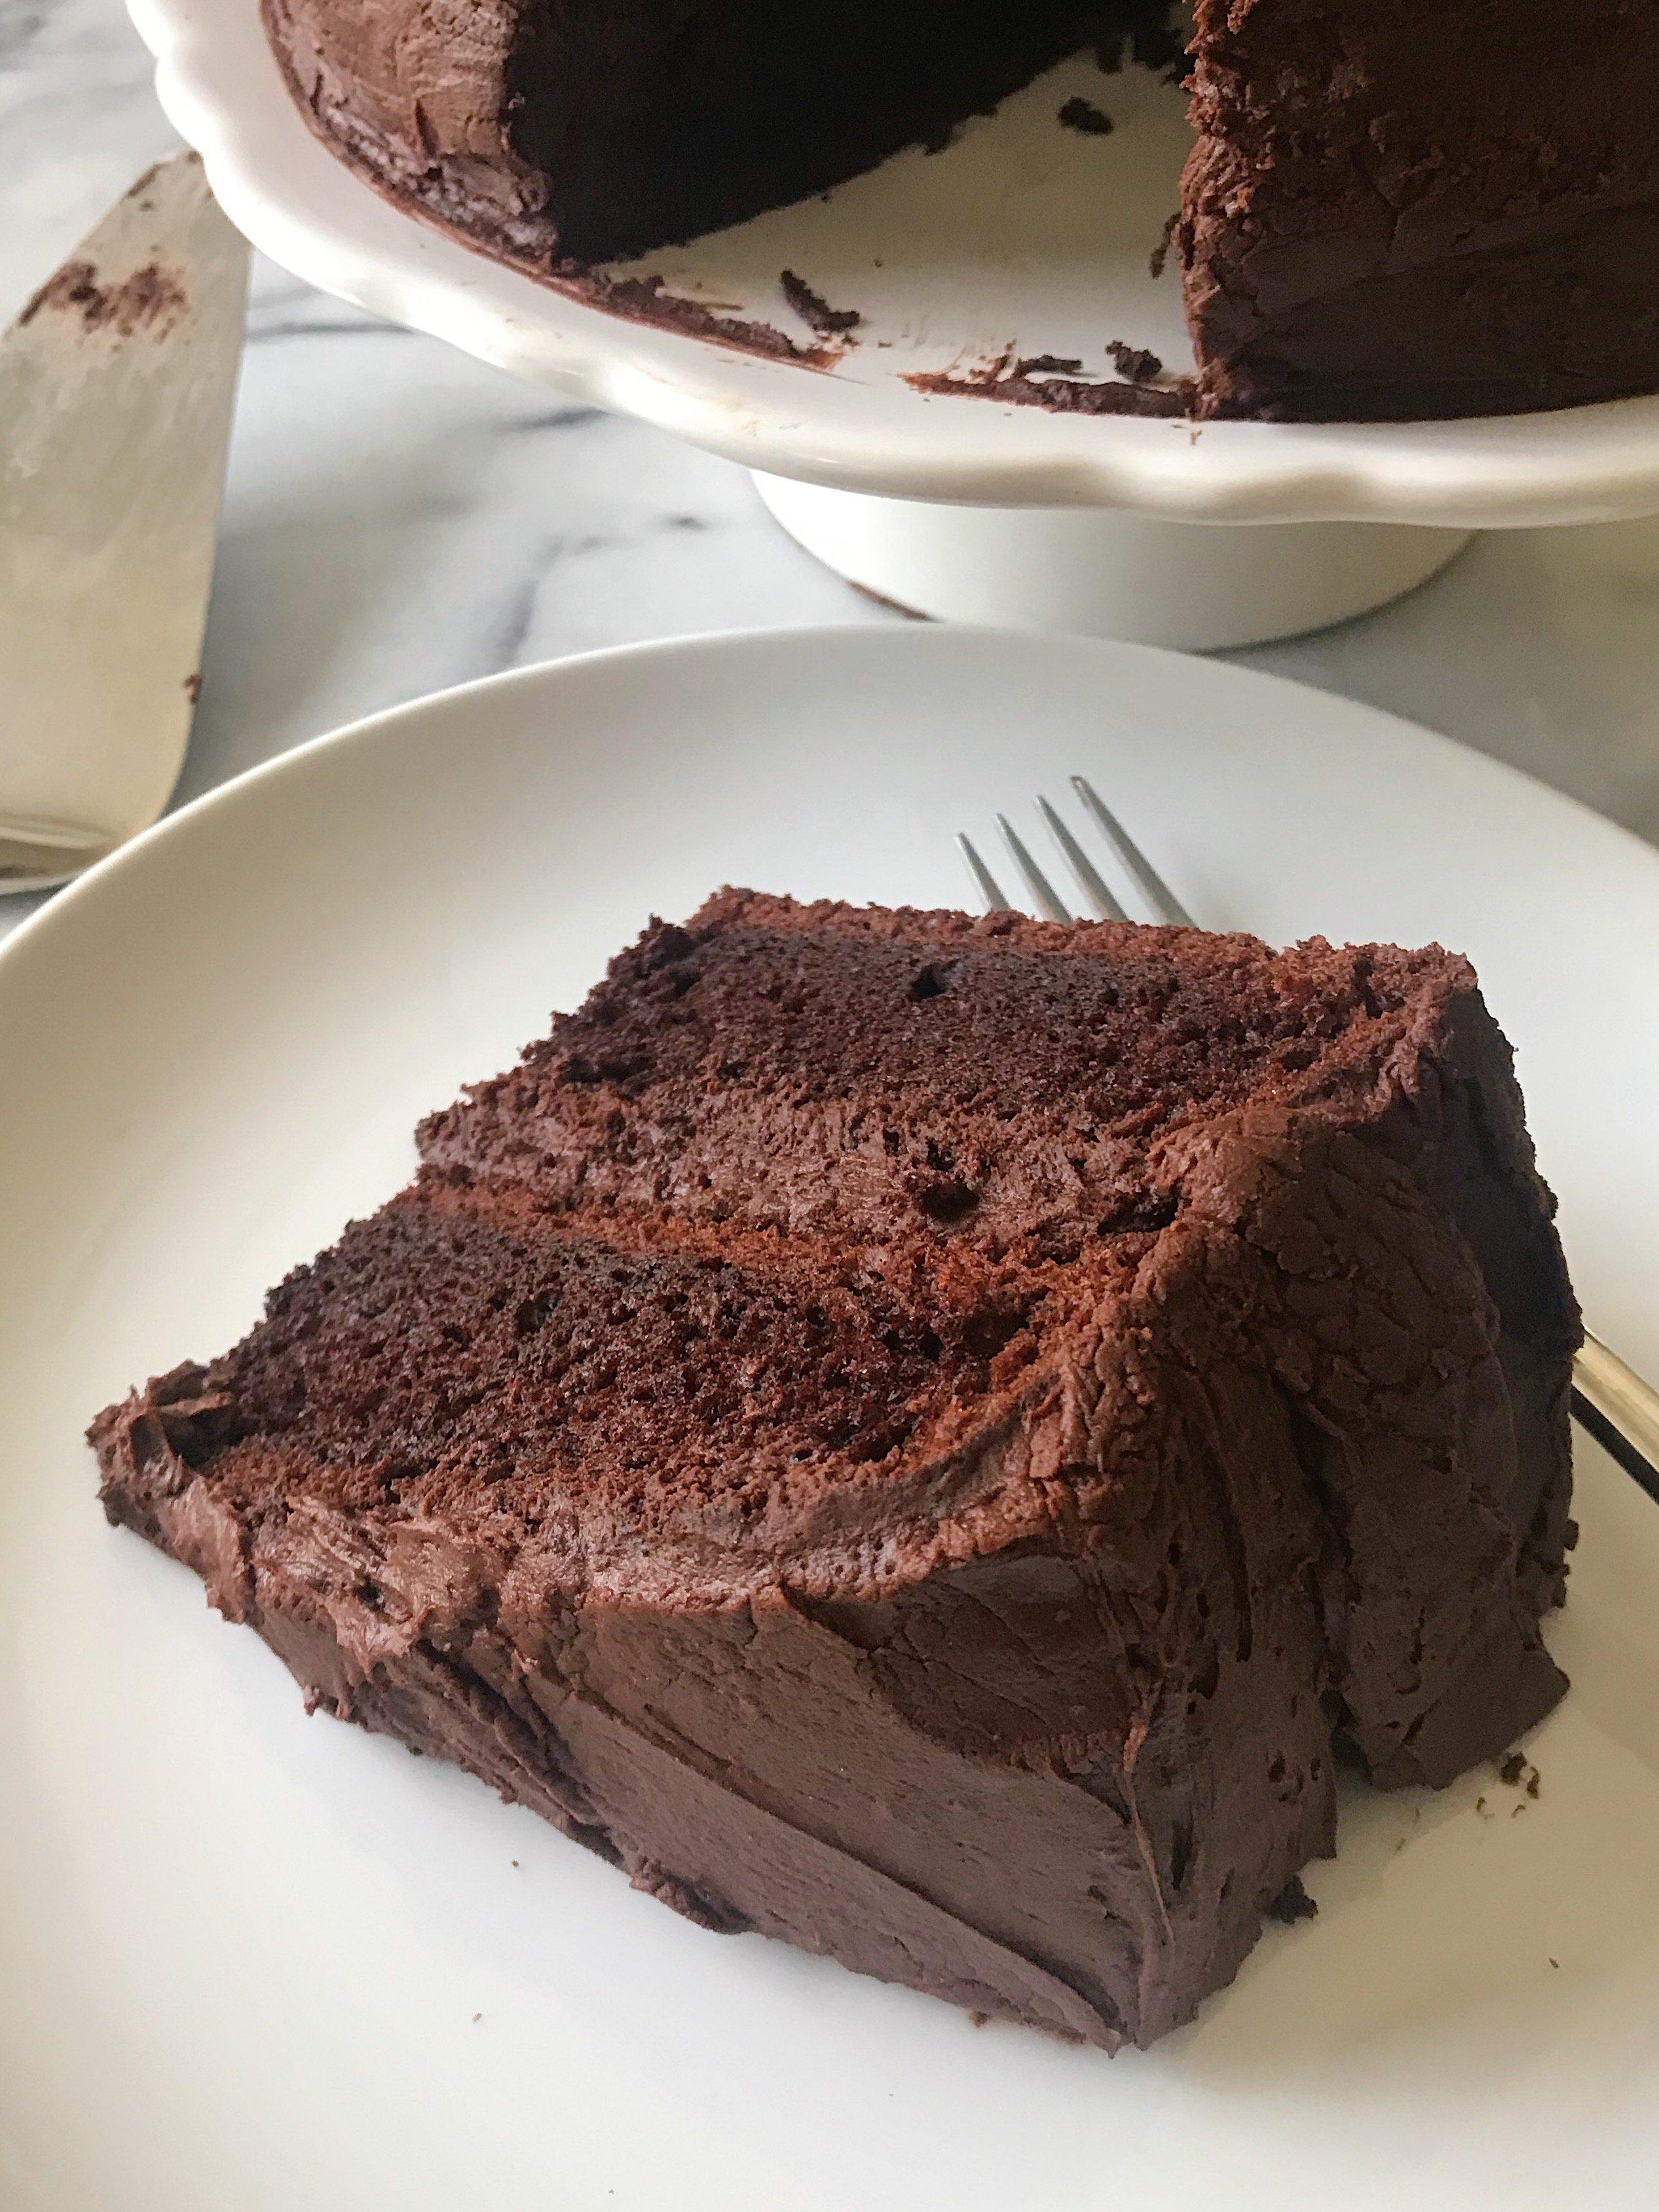 gluten free chocolate cake #glutenfree #glutenfreecake #glutenfreerecipes healthygffamily.com